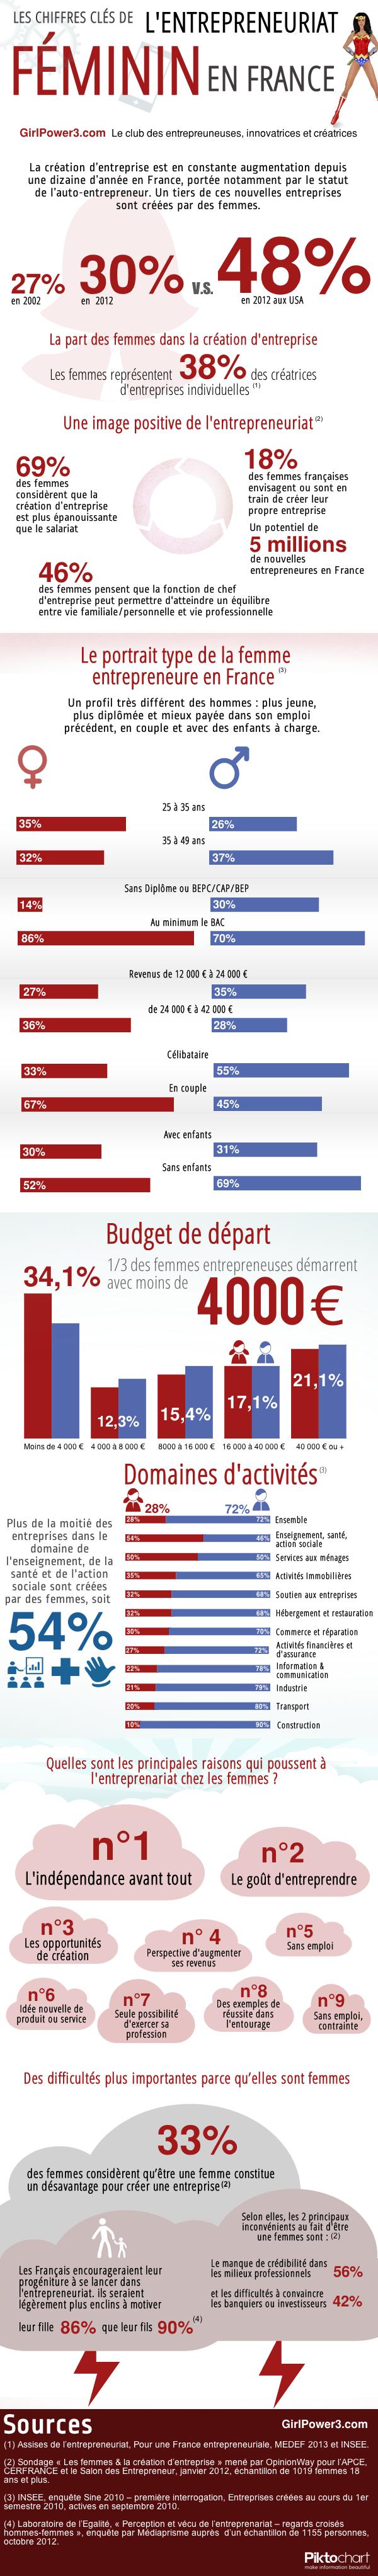 stats_femmes_entrepreneur_france_2013